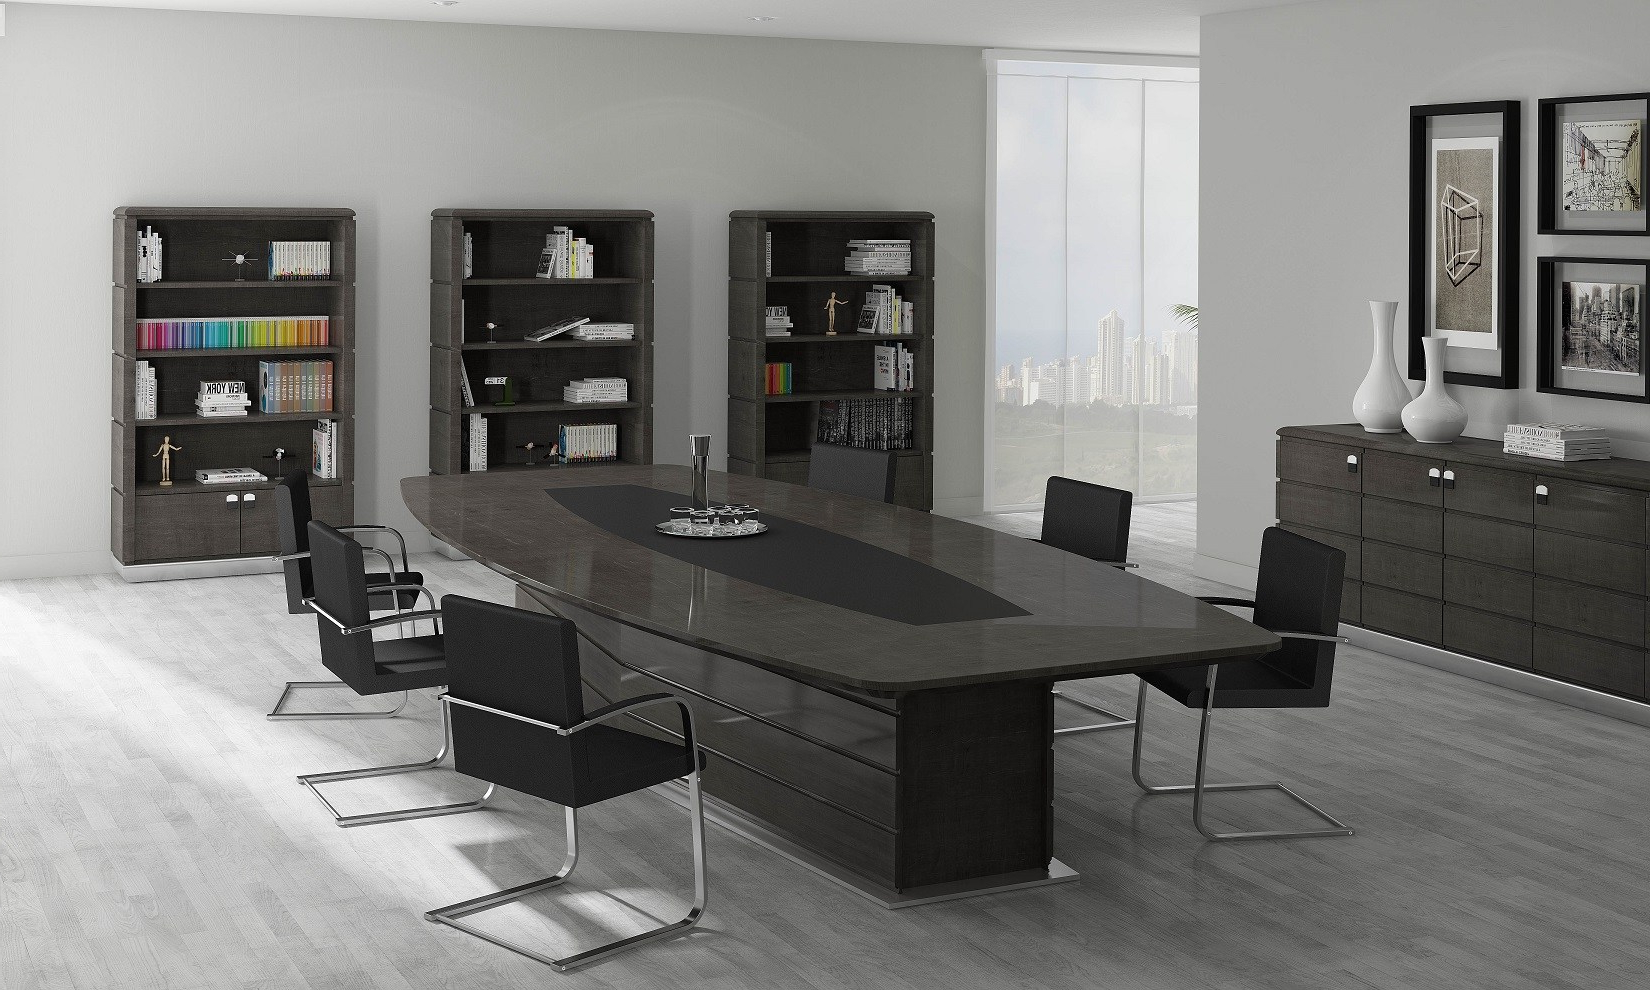 Muebles Oficina Valencia H9d9 Muebles Oficina Valencia Imagenes De Muebles De Oficina